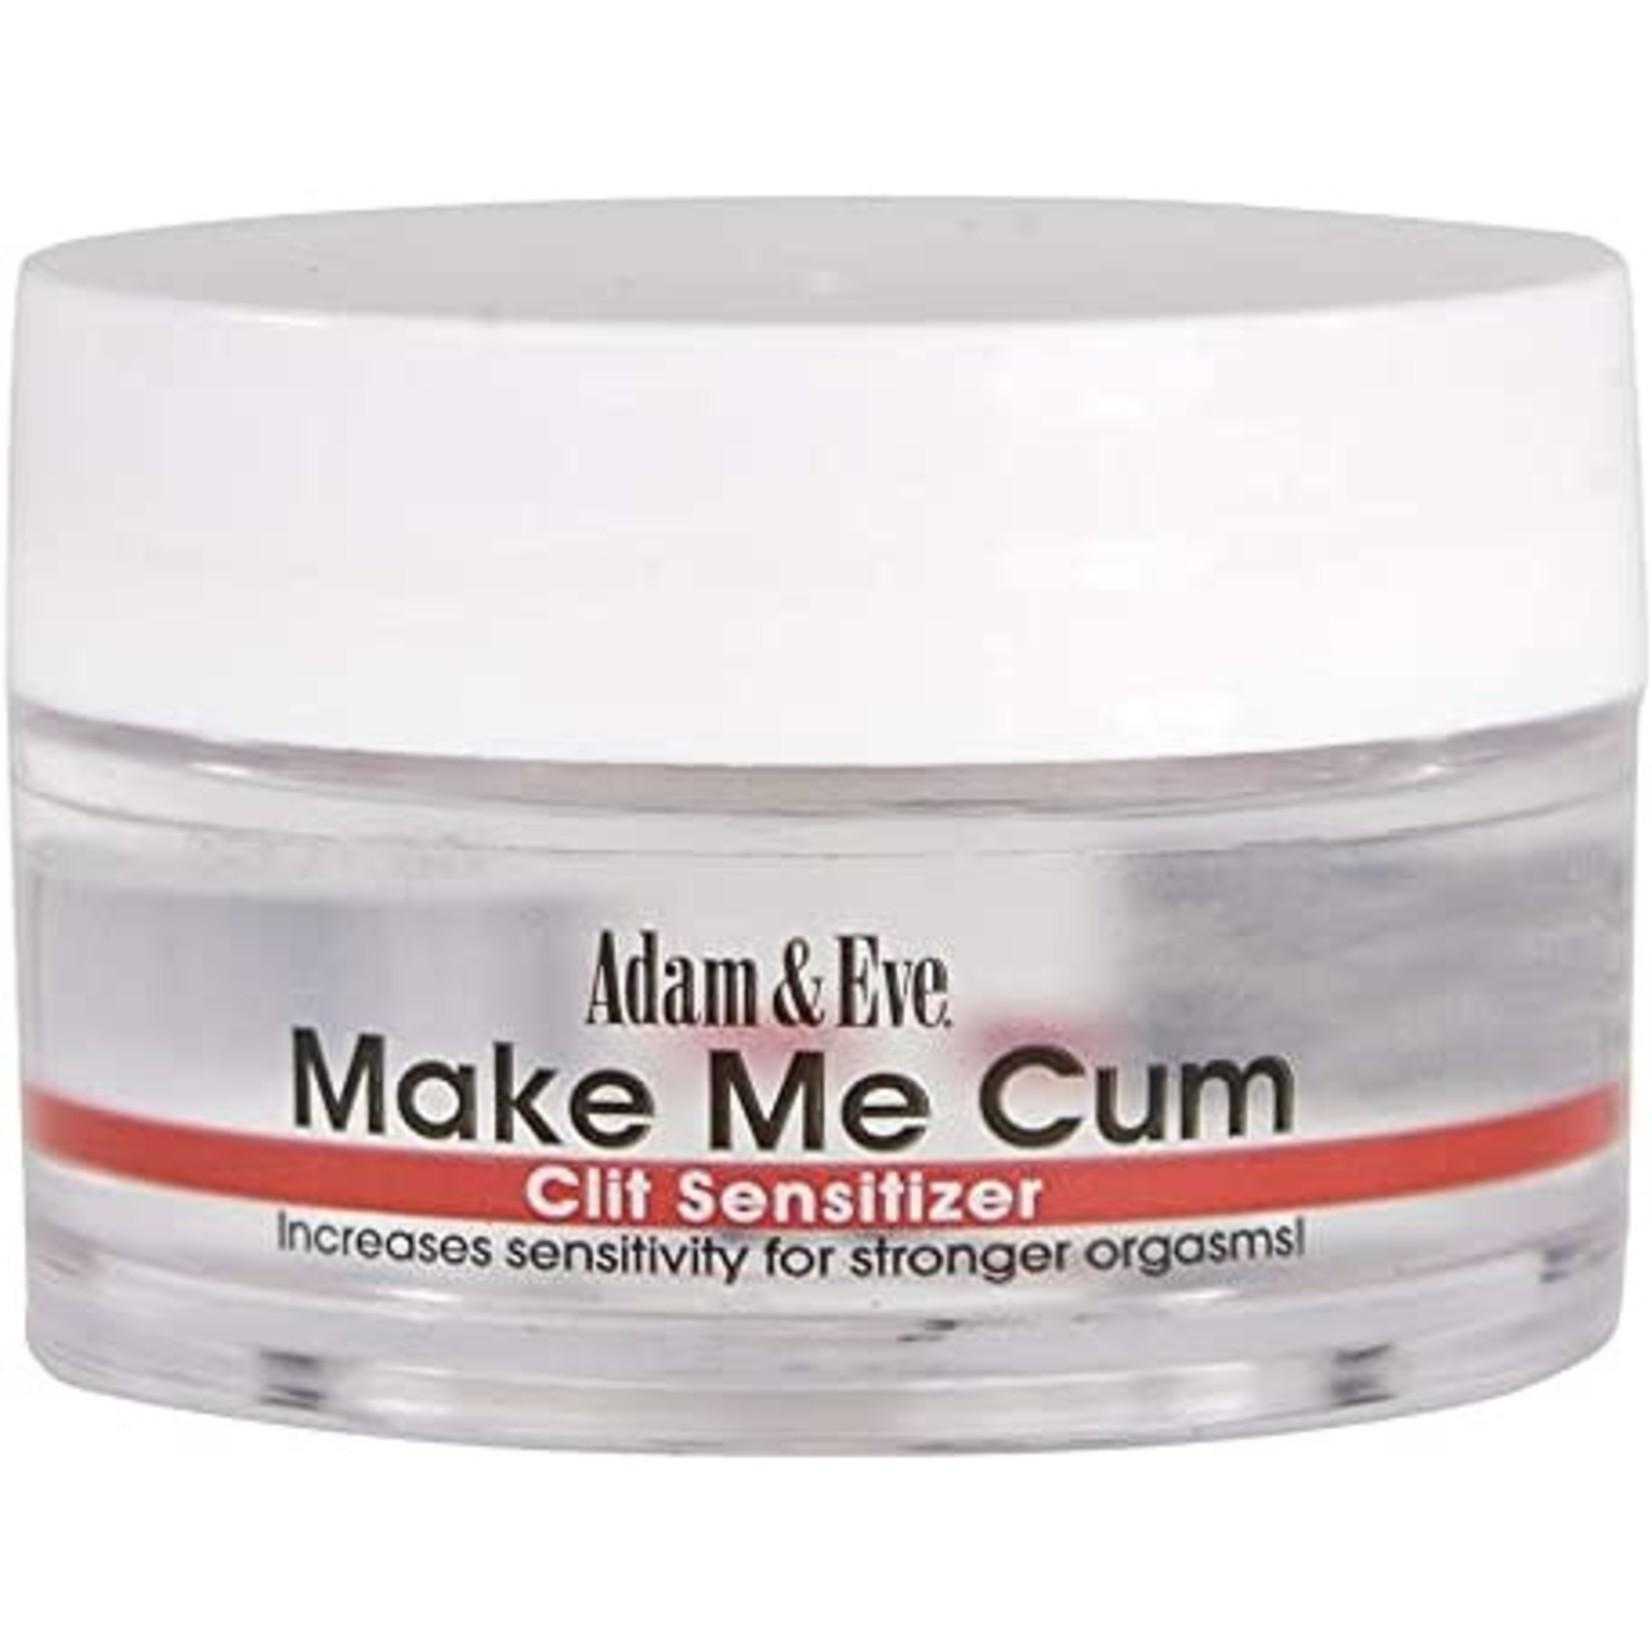 Adam & Eve Make Me Cum Clit Sensitizer .5oz